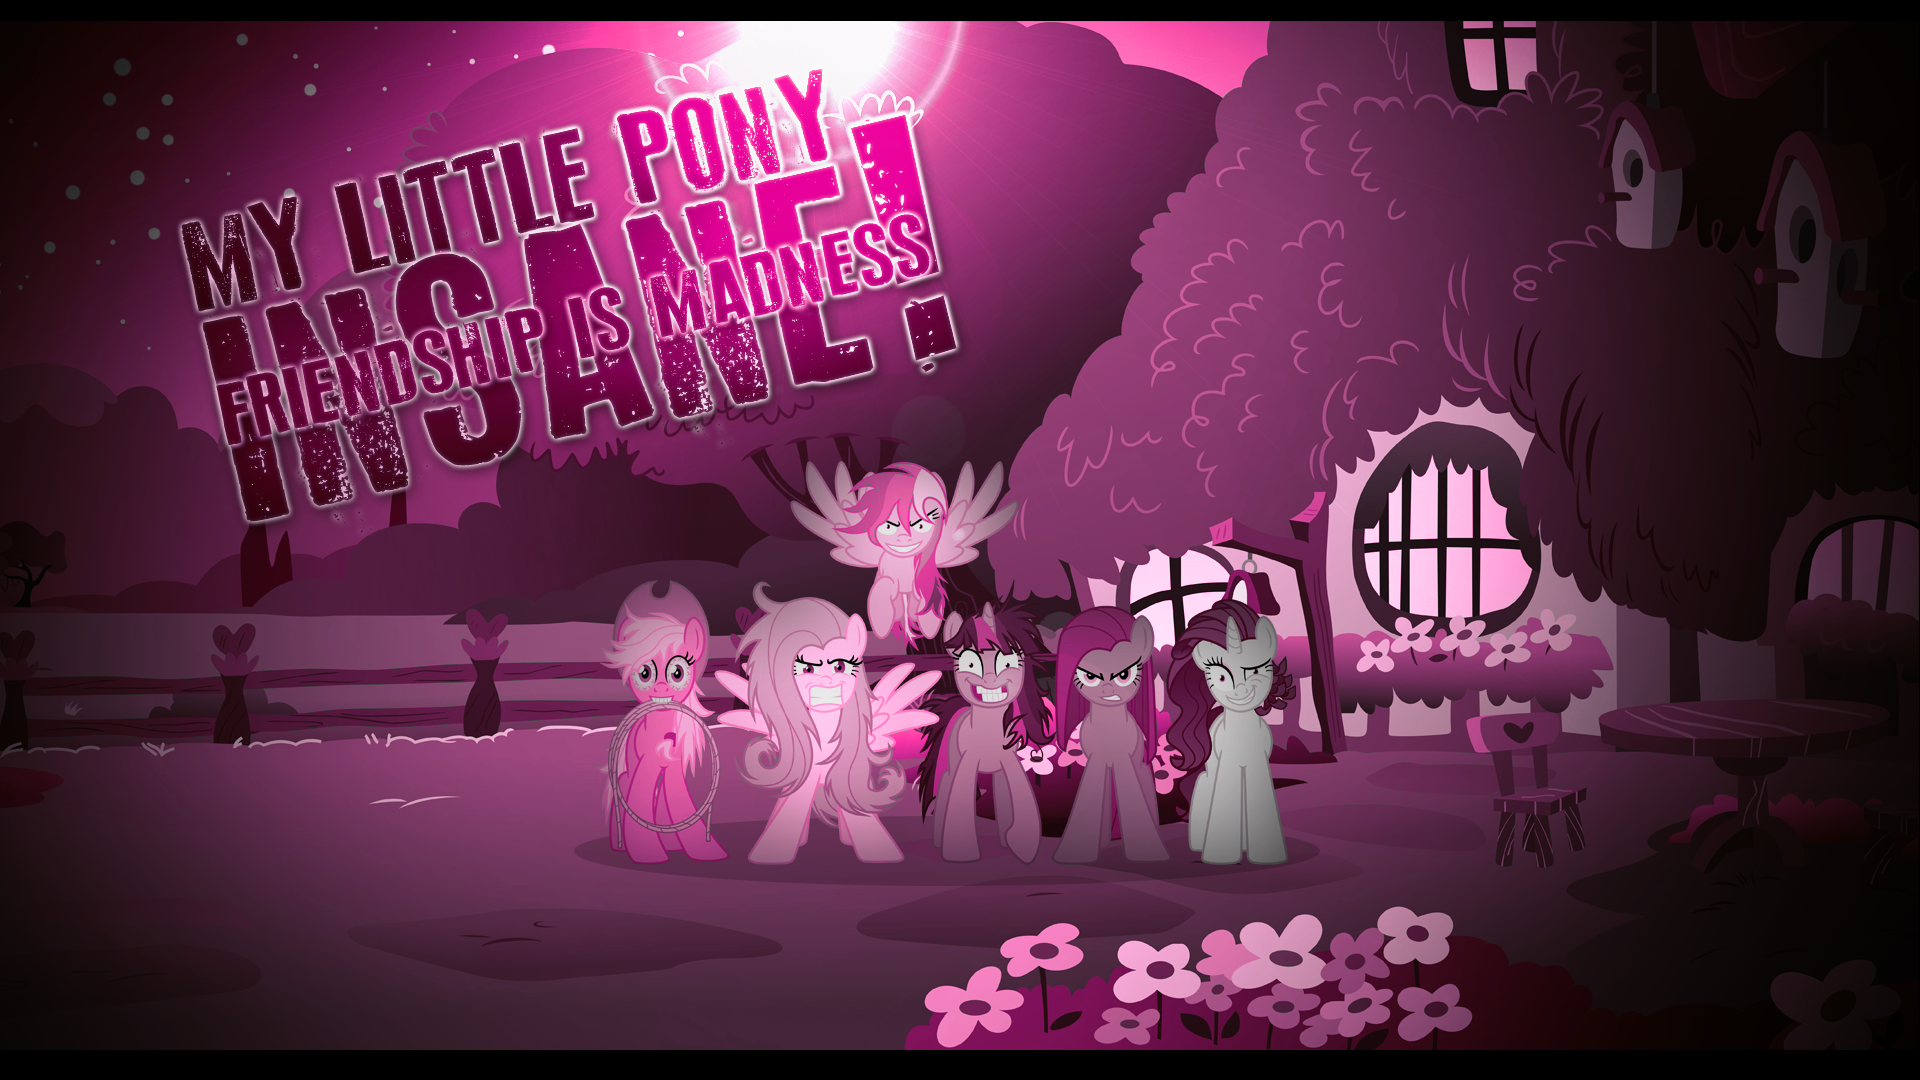 Uploaded by Background Pony 17:04, September 16, 2012